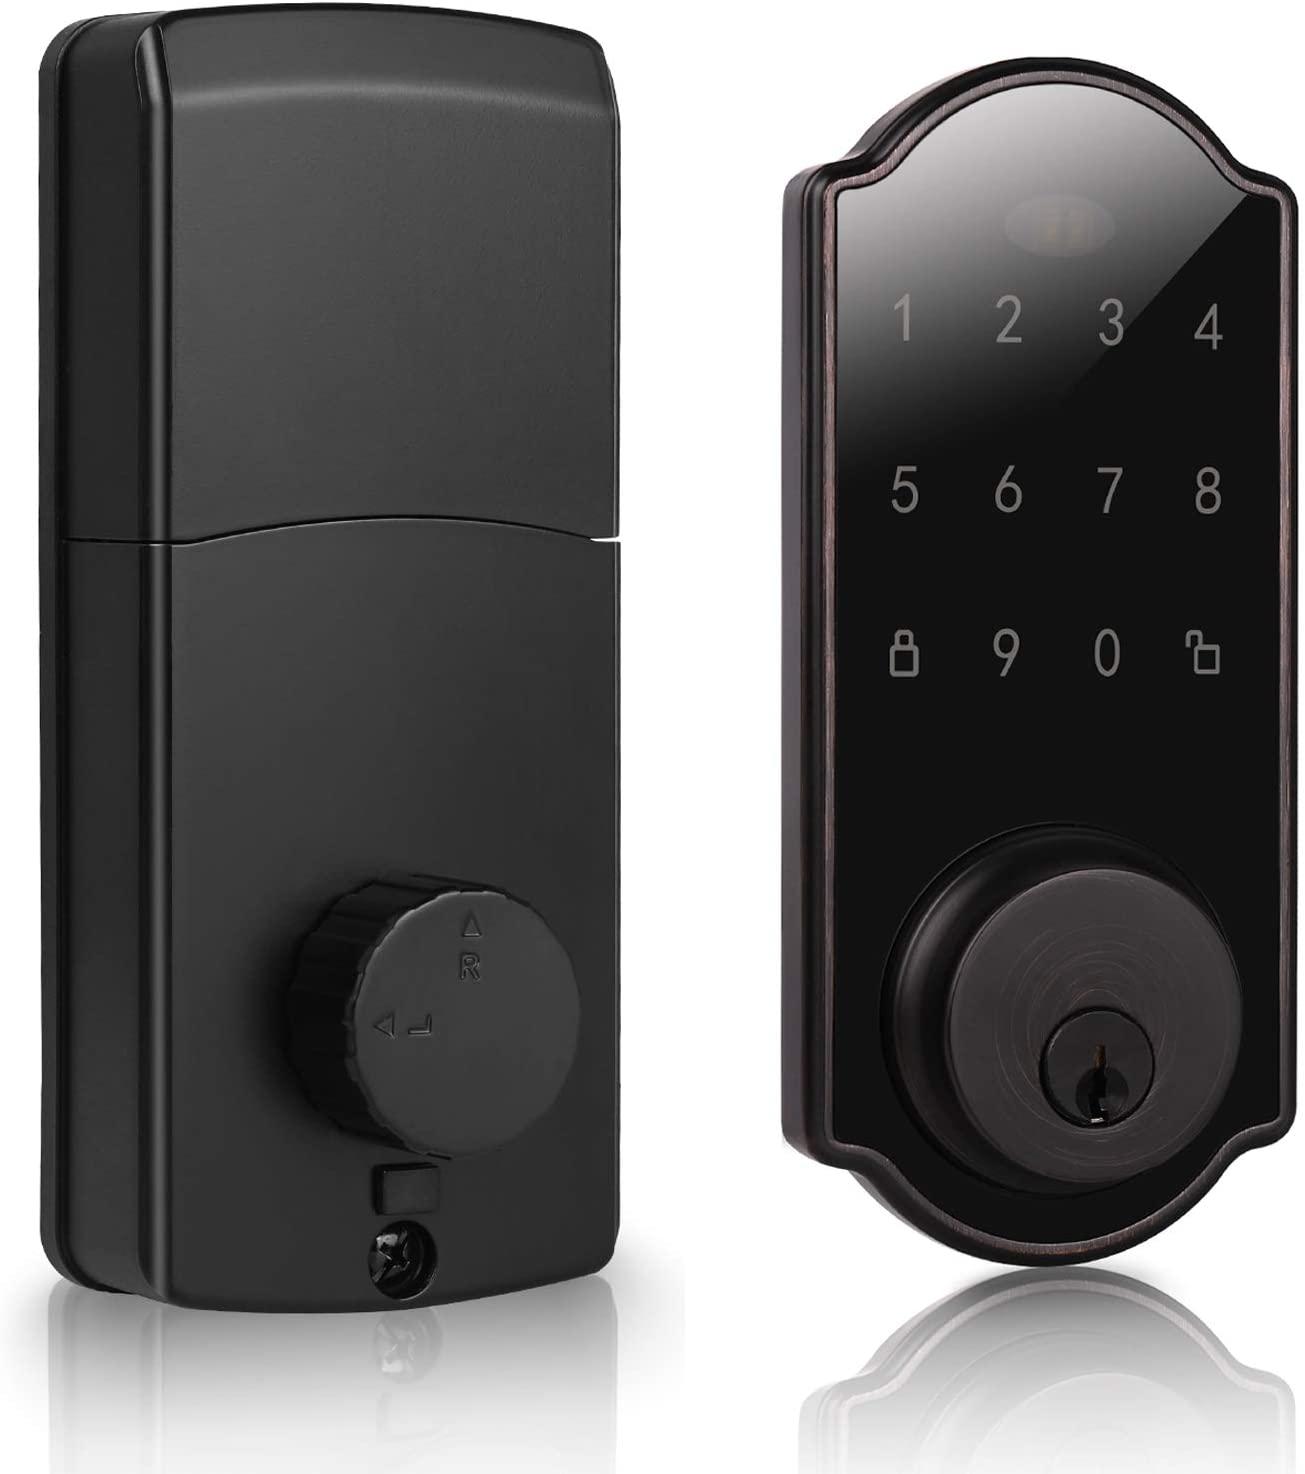 DECORITEN Smart Electronic Door Lock, User Code Touch Screen Keypad Deadbolt Entrance Smart Electronic Digital Door Lock with Keys in Oil-Rubbed Bronze Finish, for Home Hotels Apartment